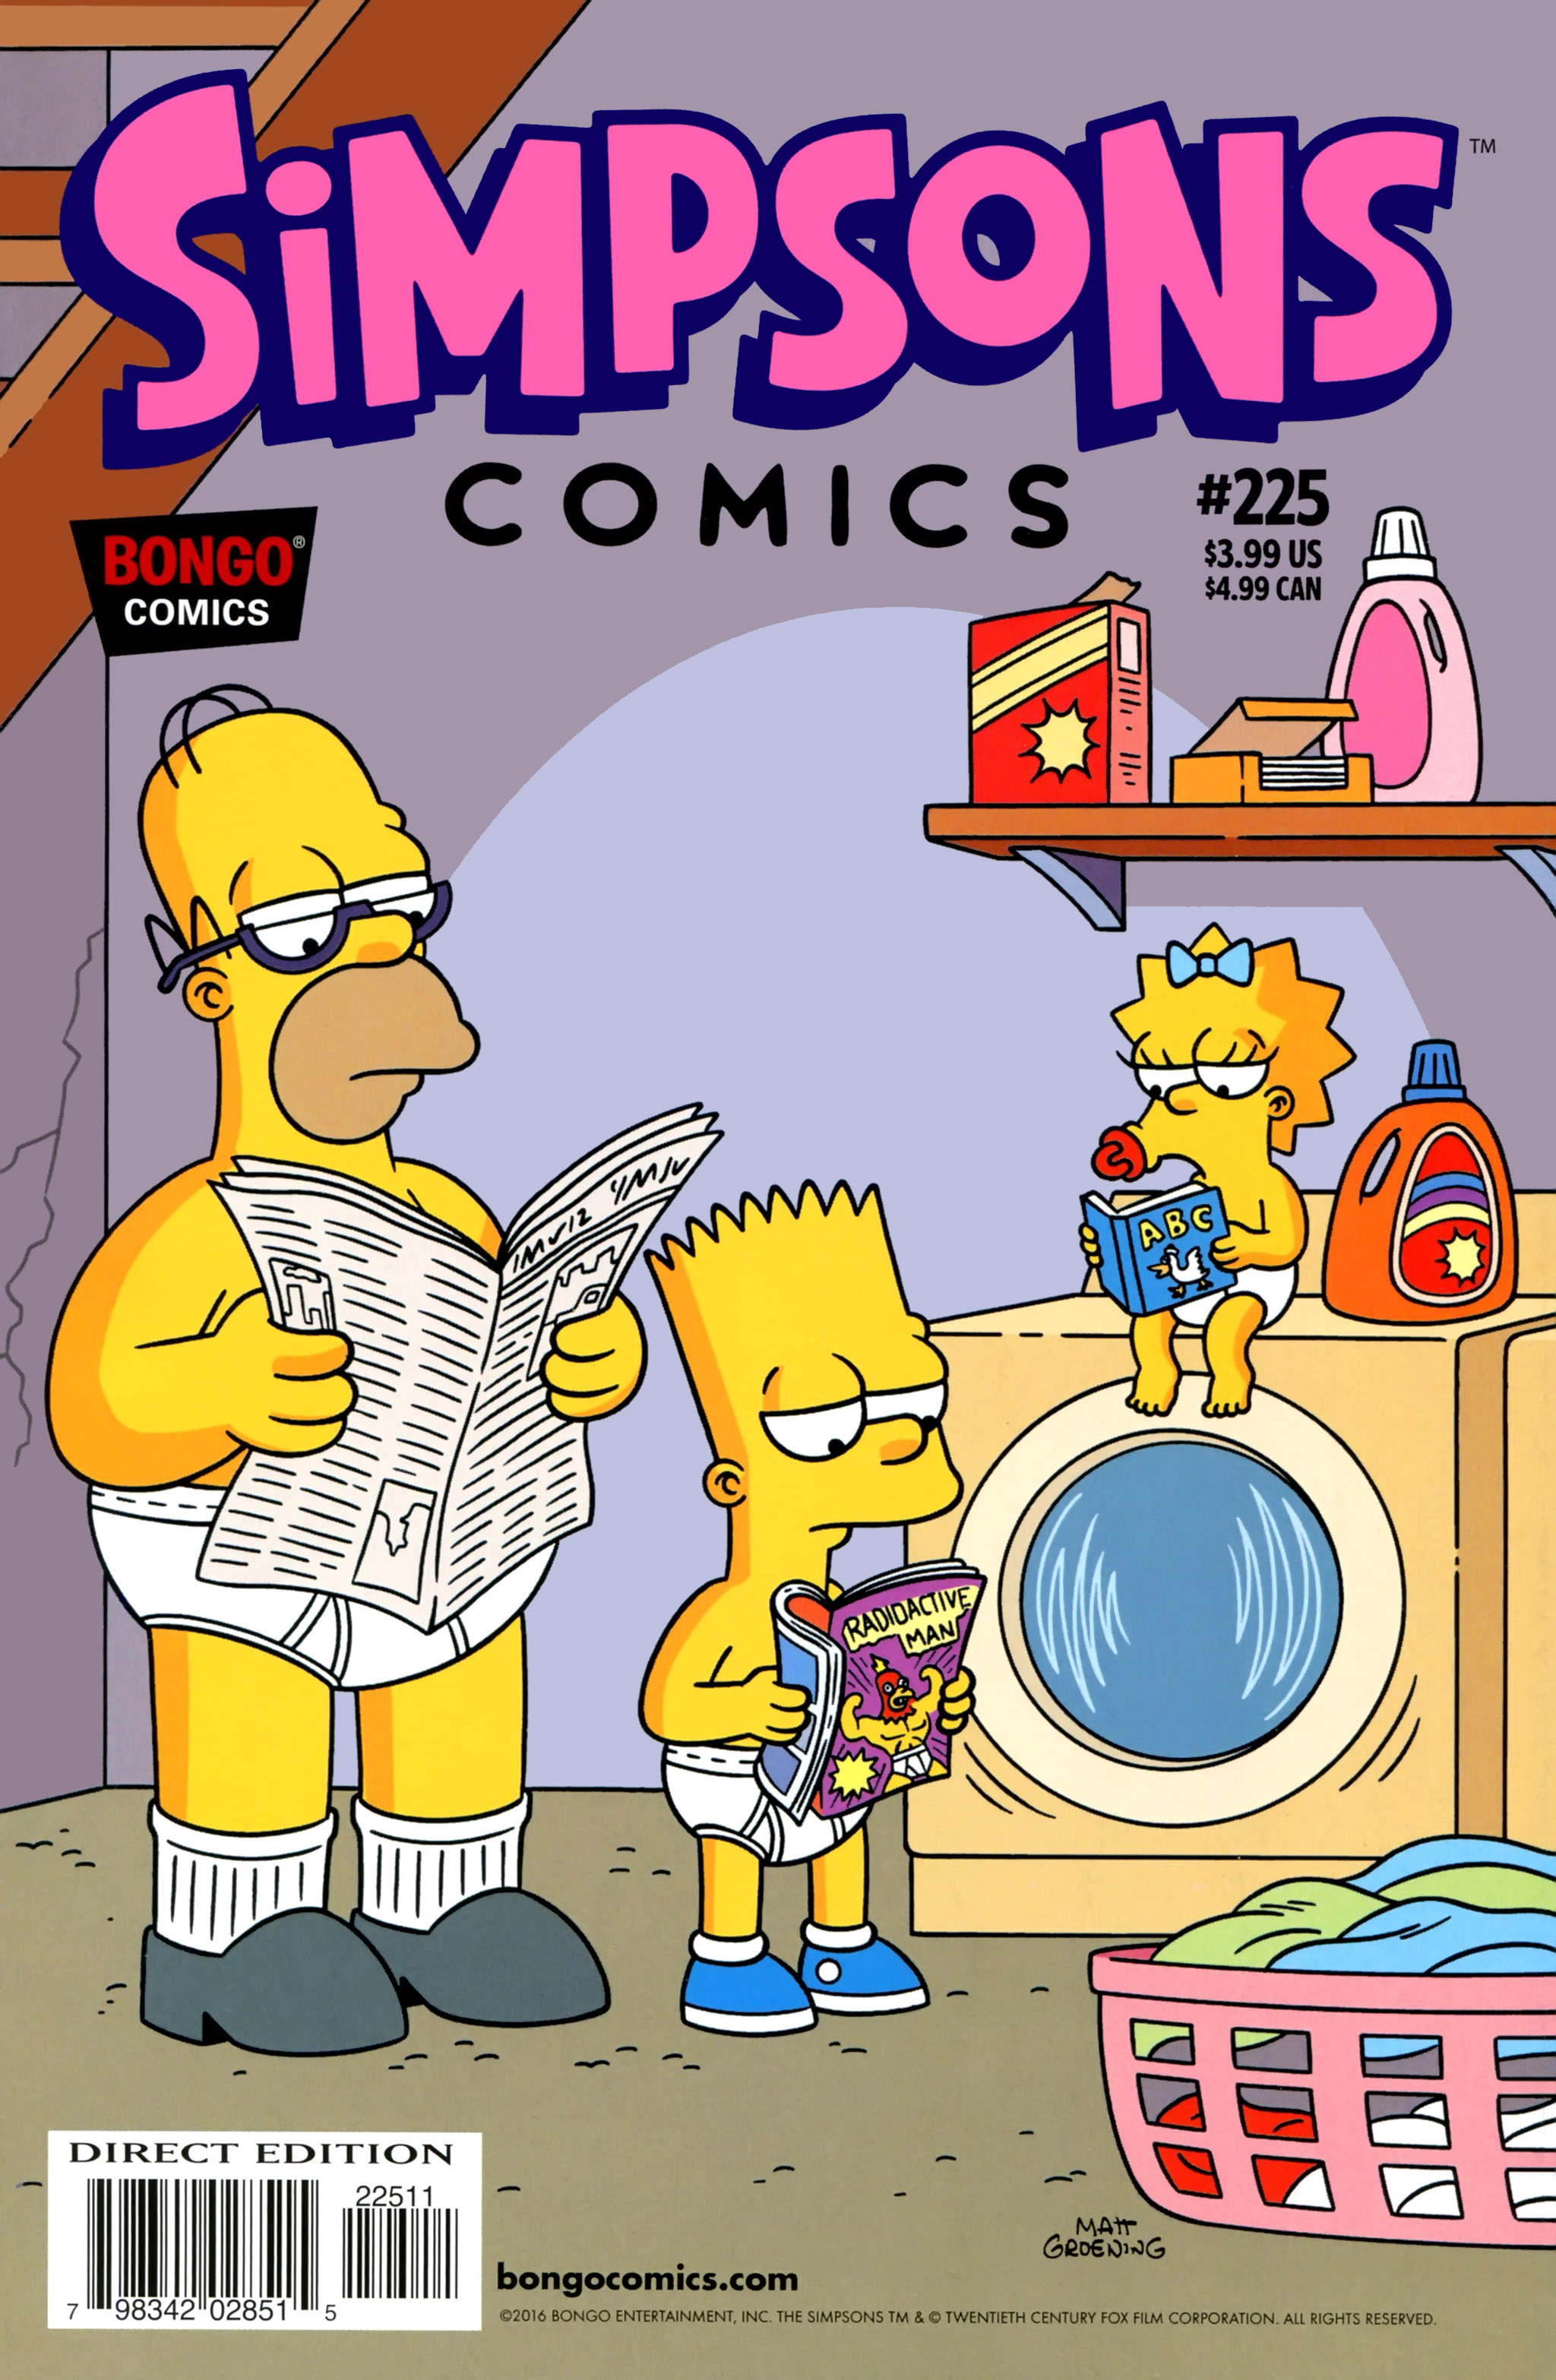 Simpsons Comics 225 Page 1